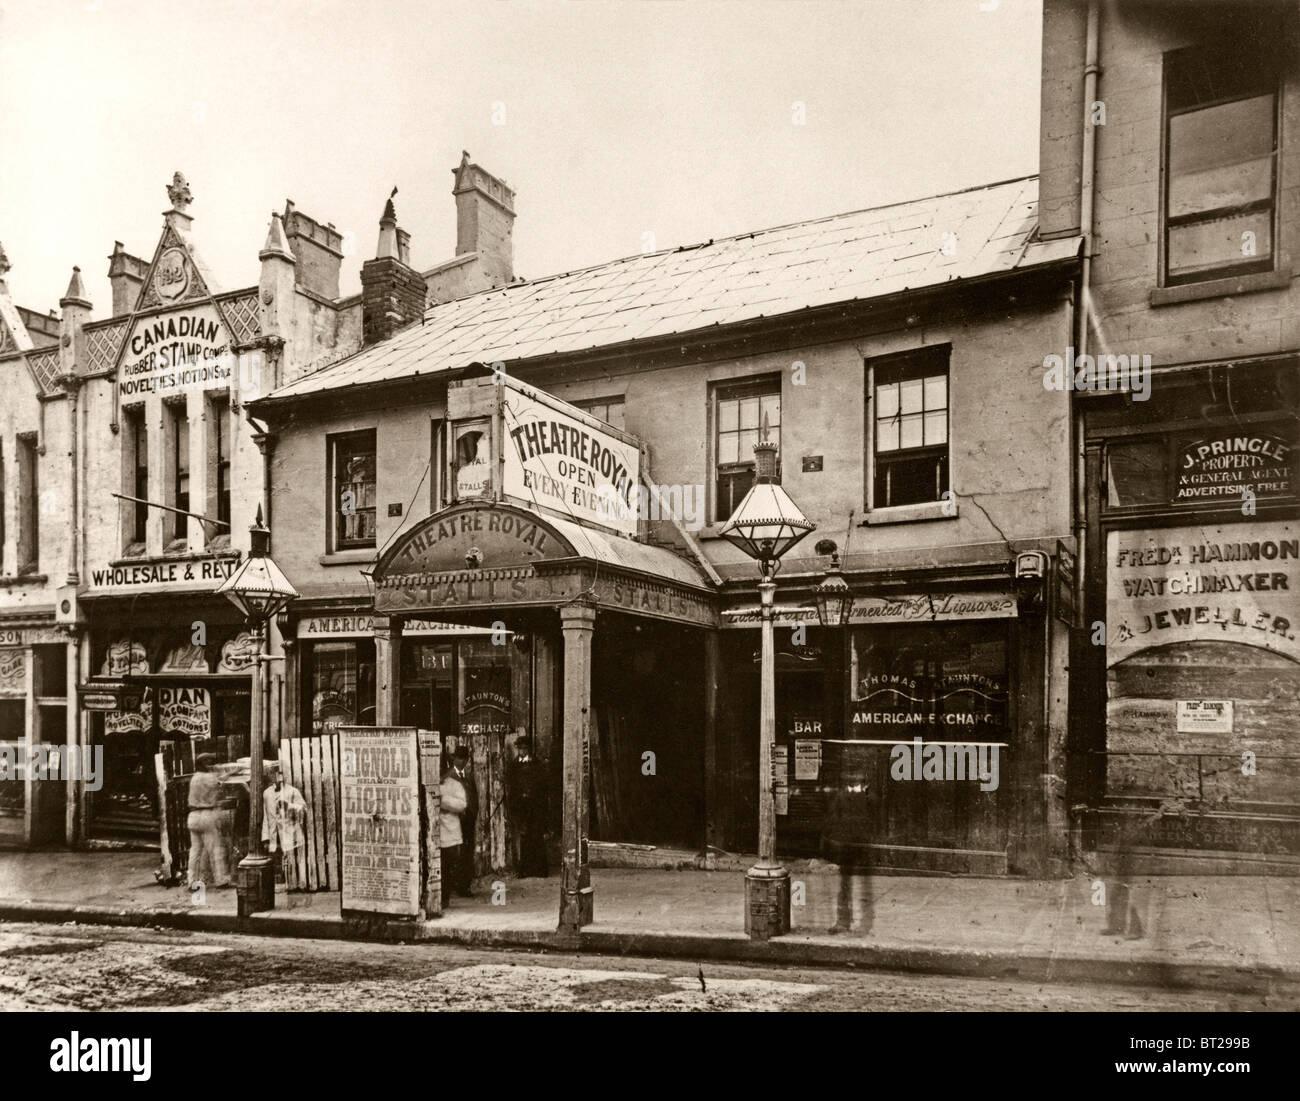 The Theatre Royal, King Street, Sydney, NSW, Australia c. 1880 - Stock Image